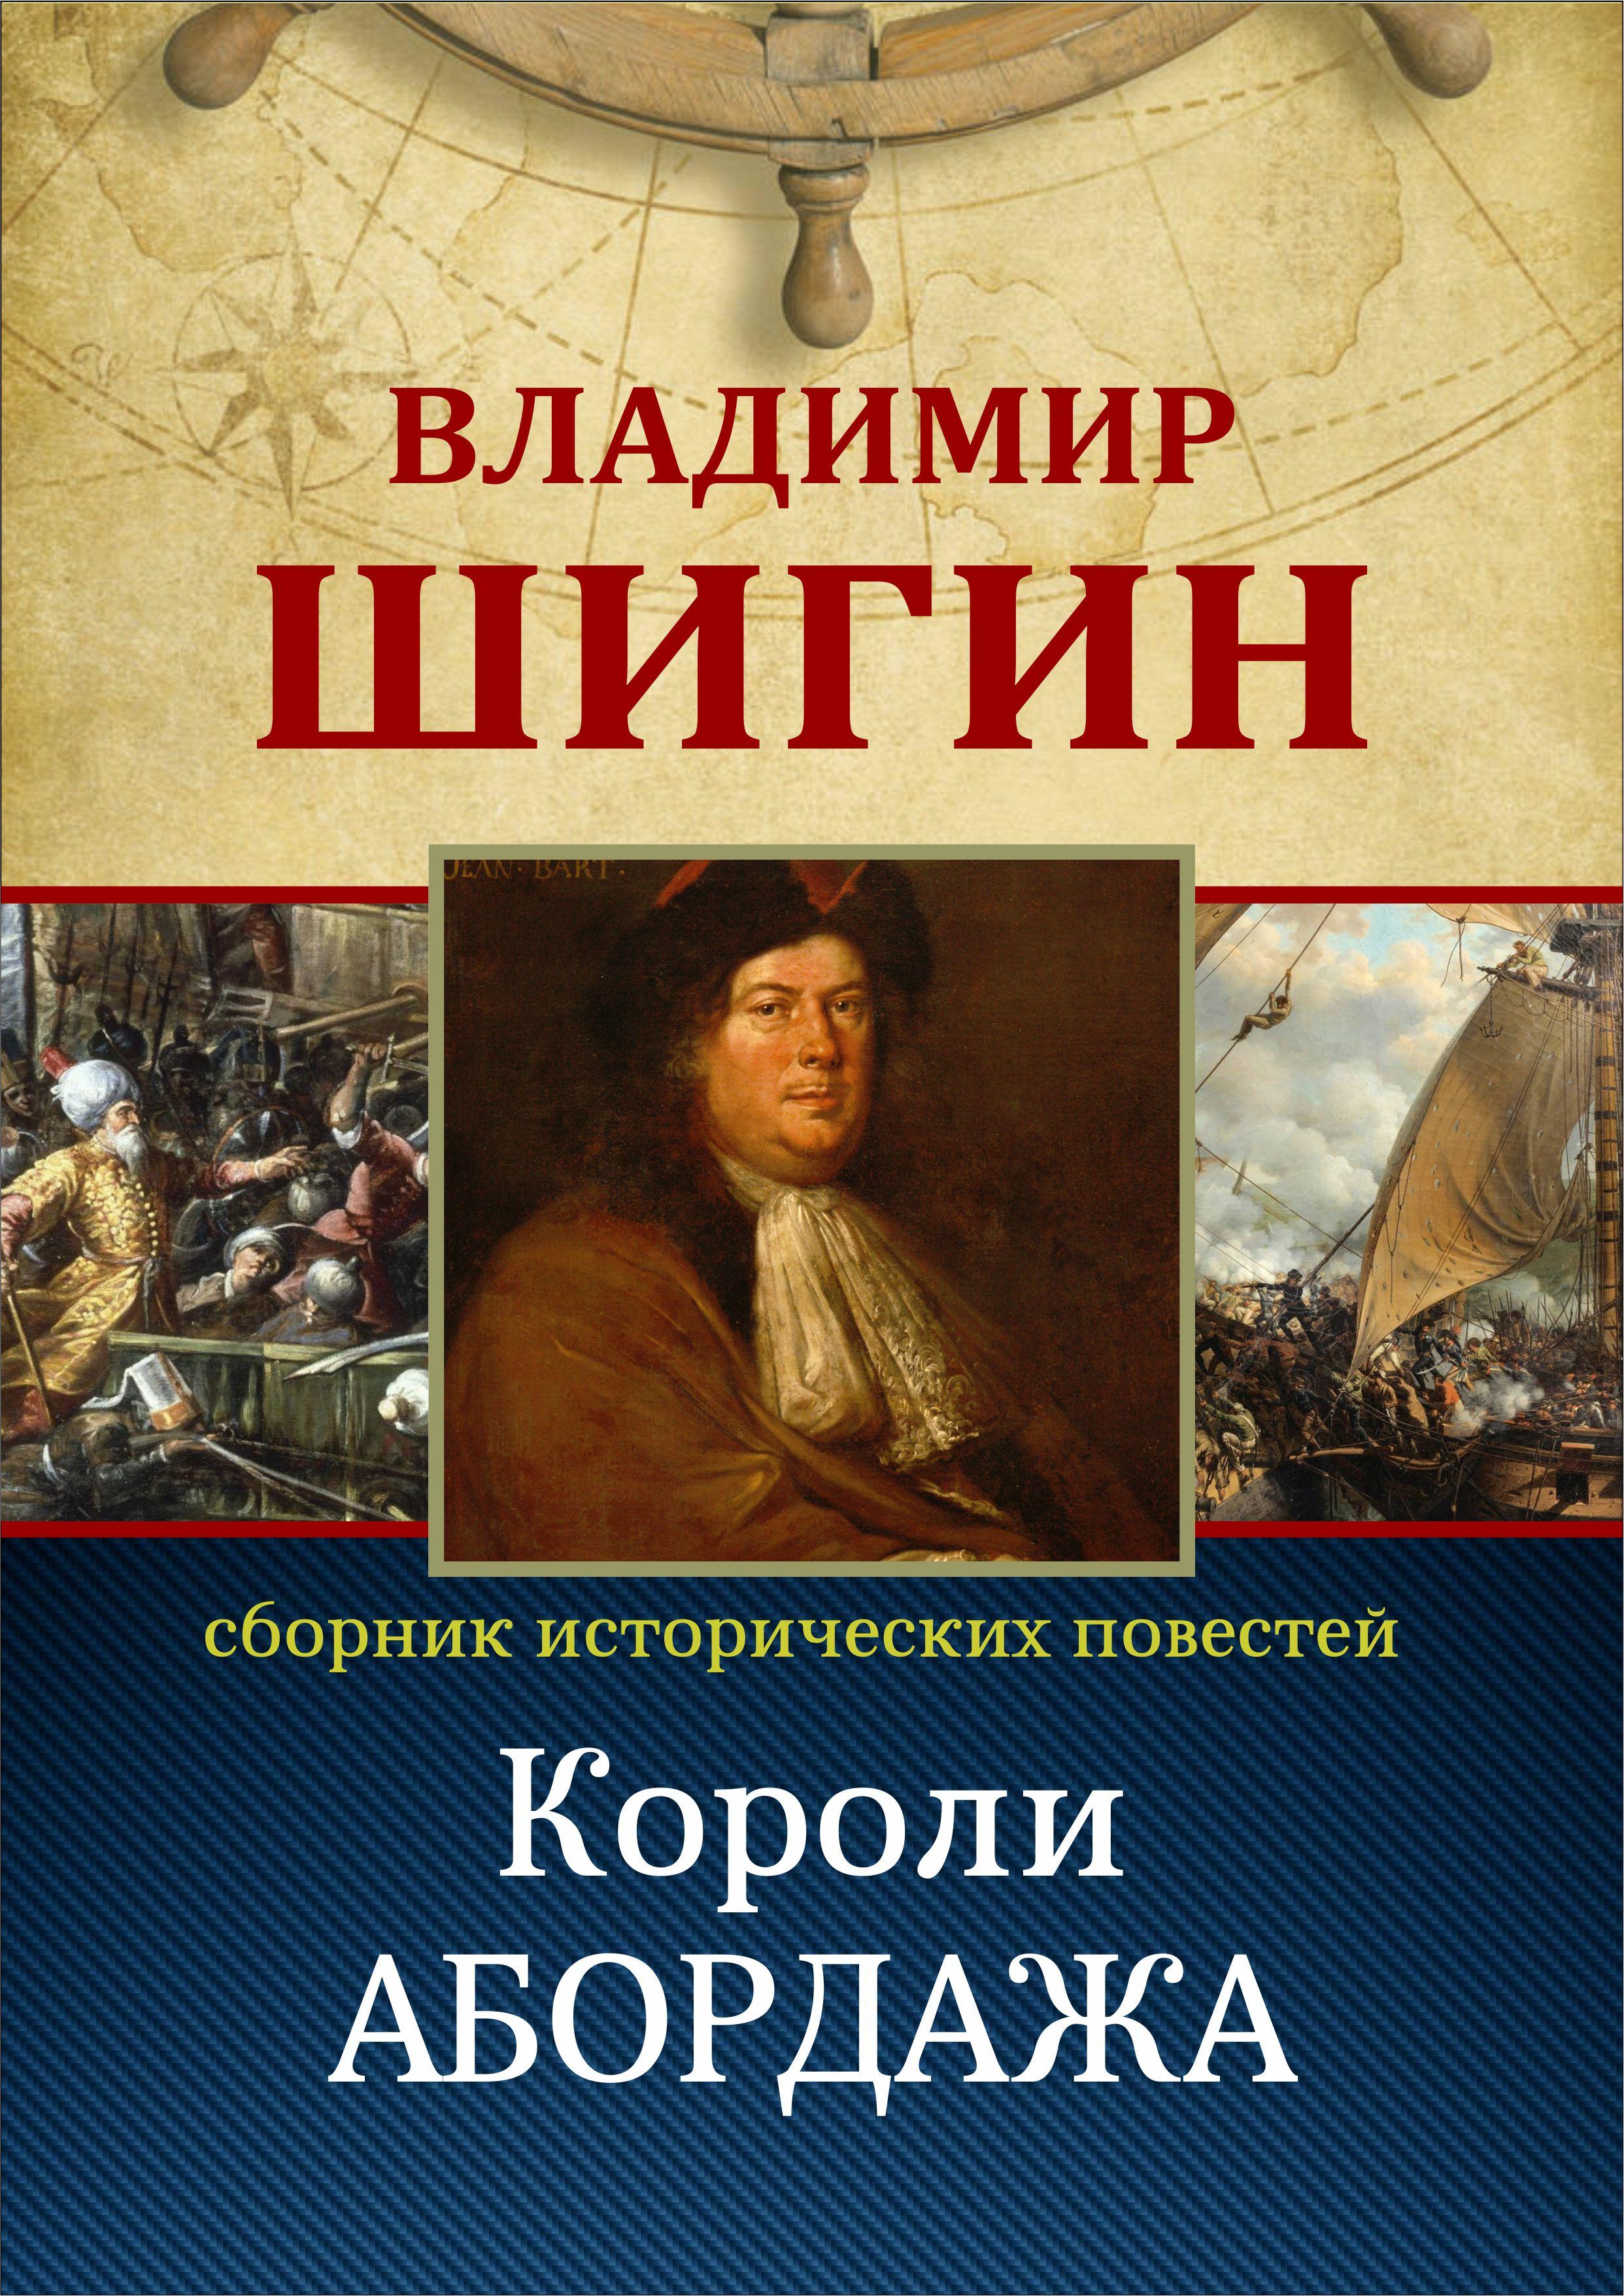 Короли абордажа (Собрание сочинений) ( Владимир Шигин  )